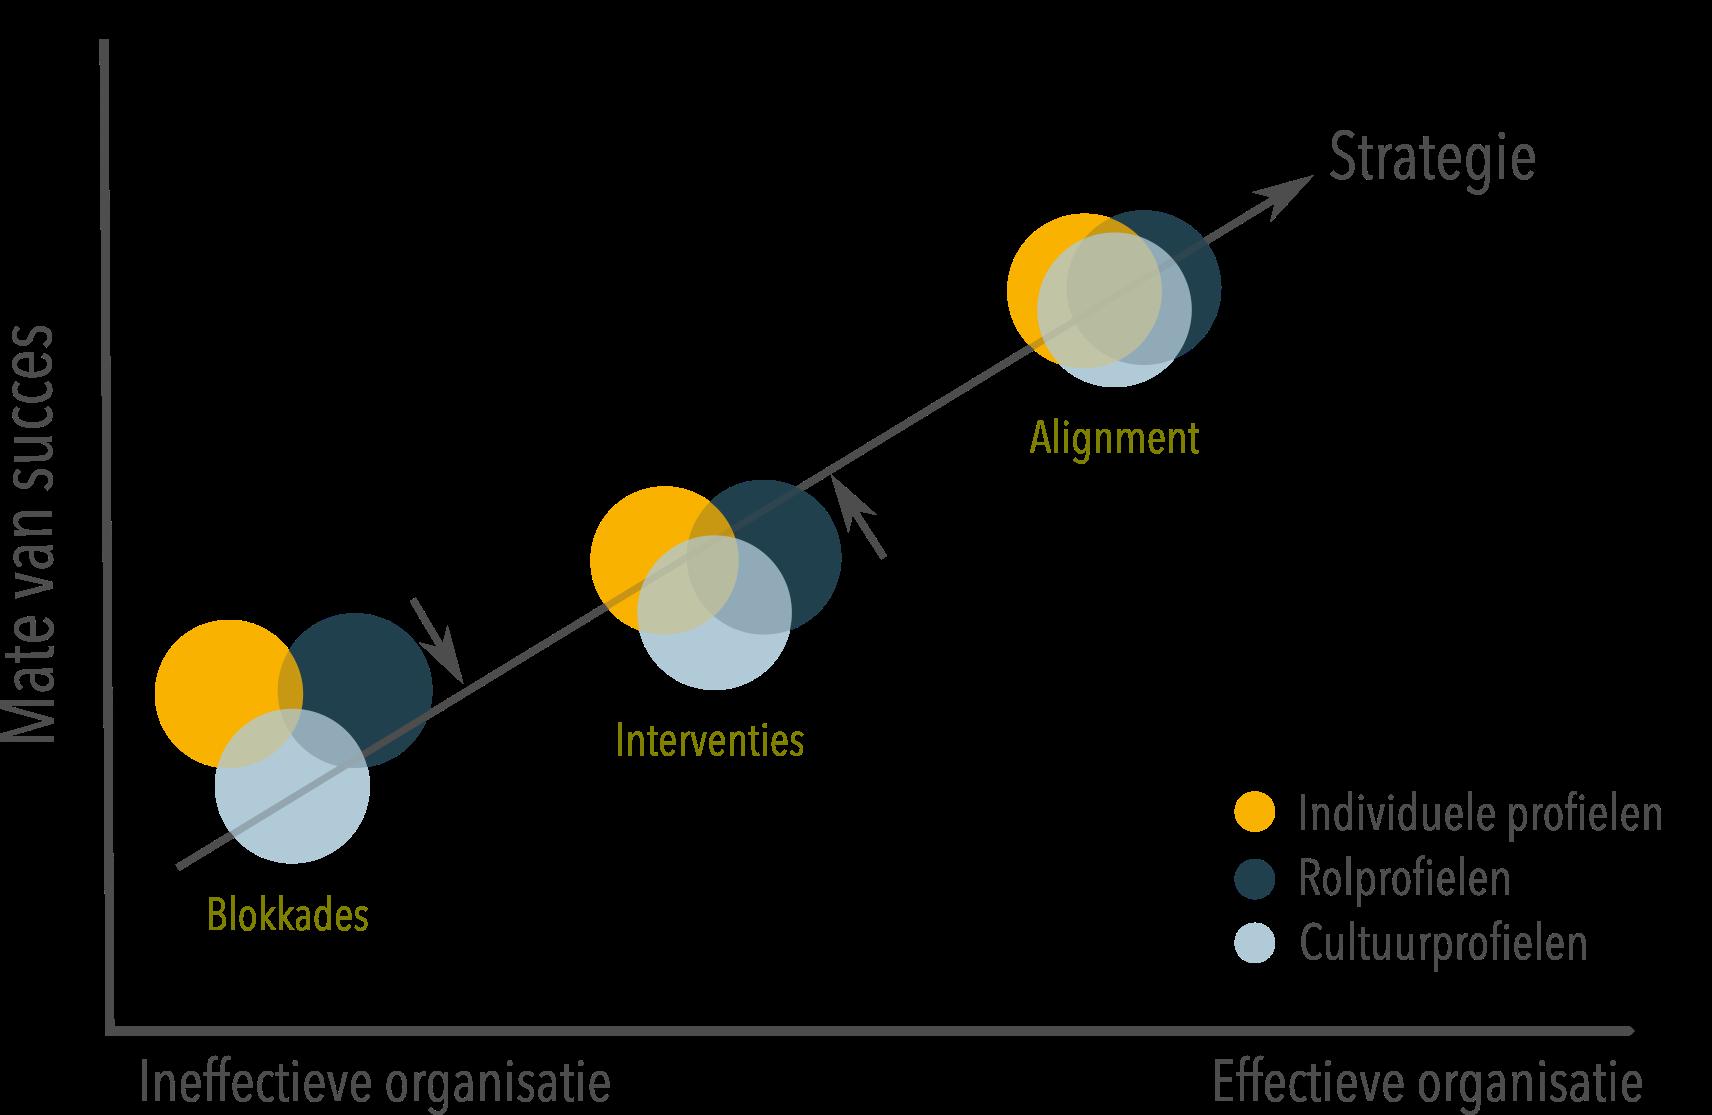 Model organisatieontwikkeling